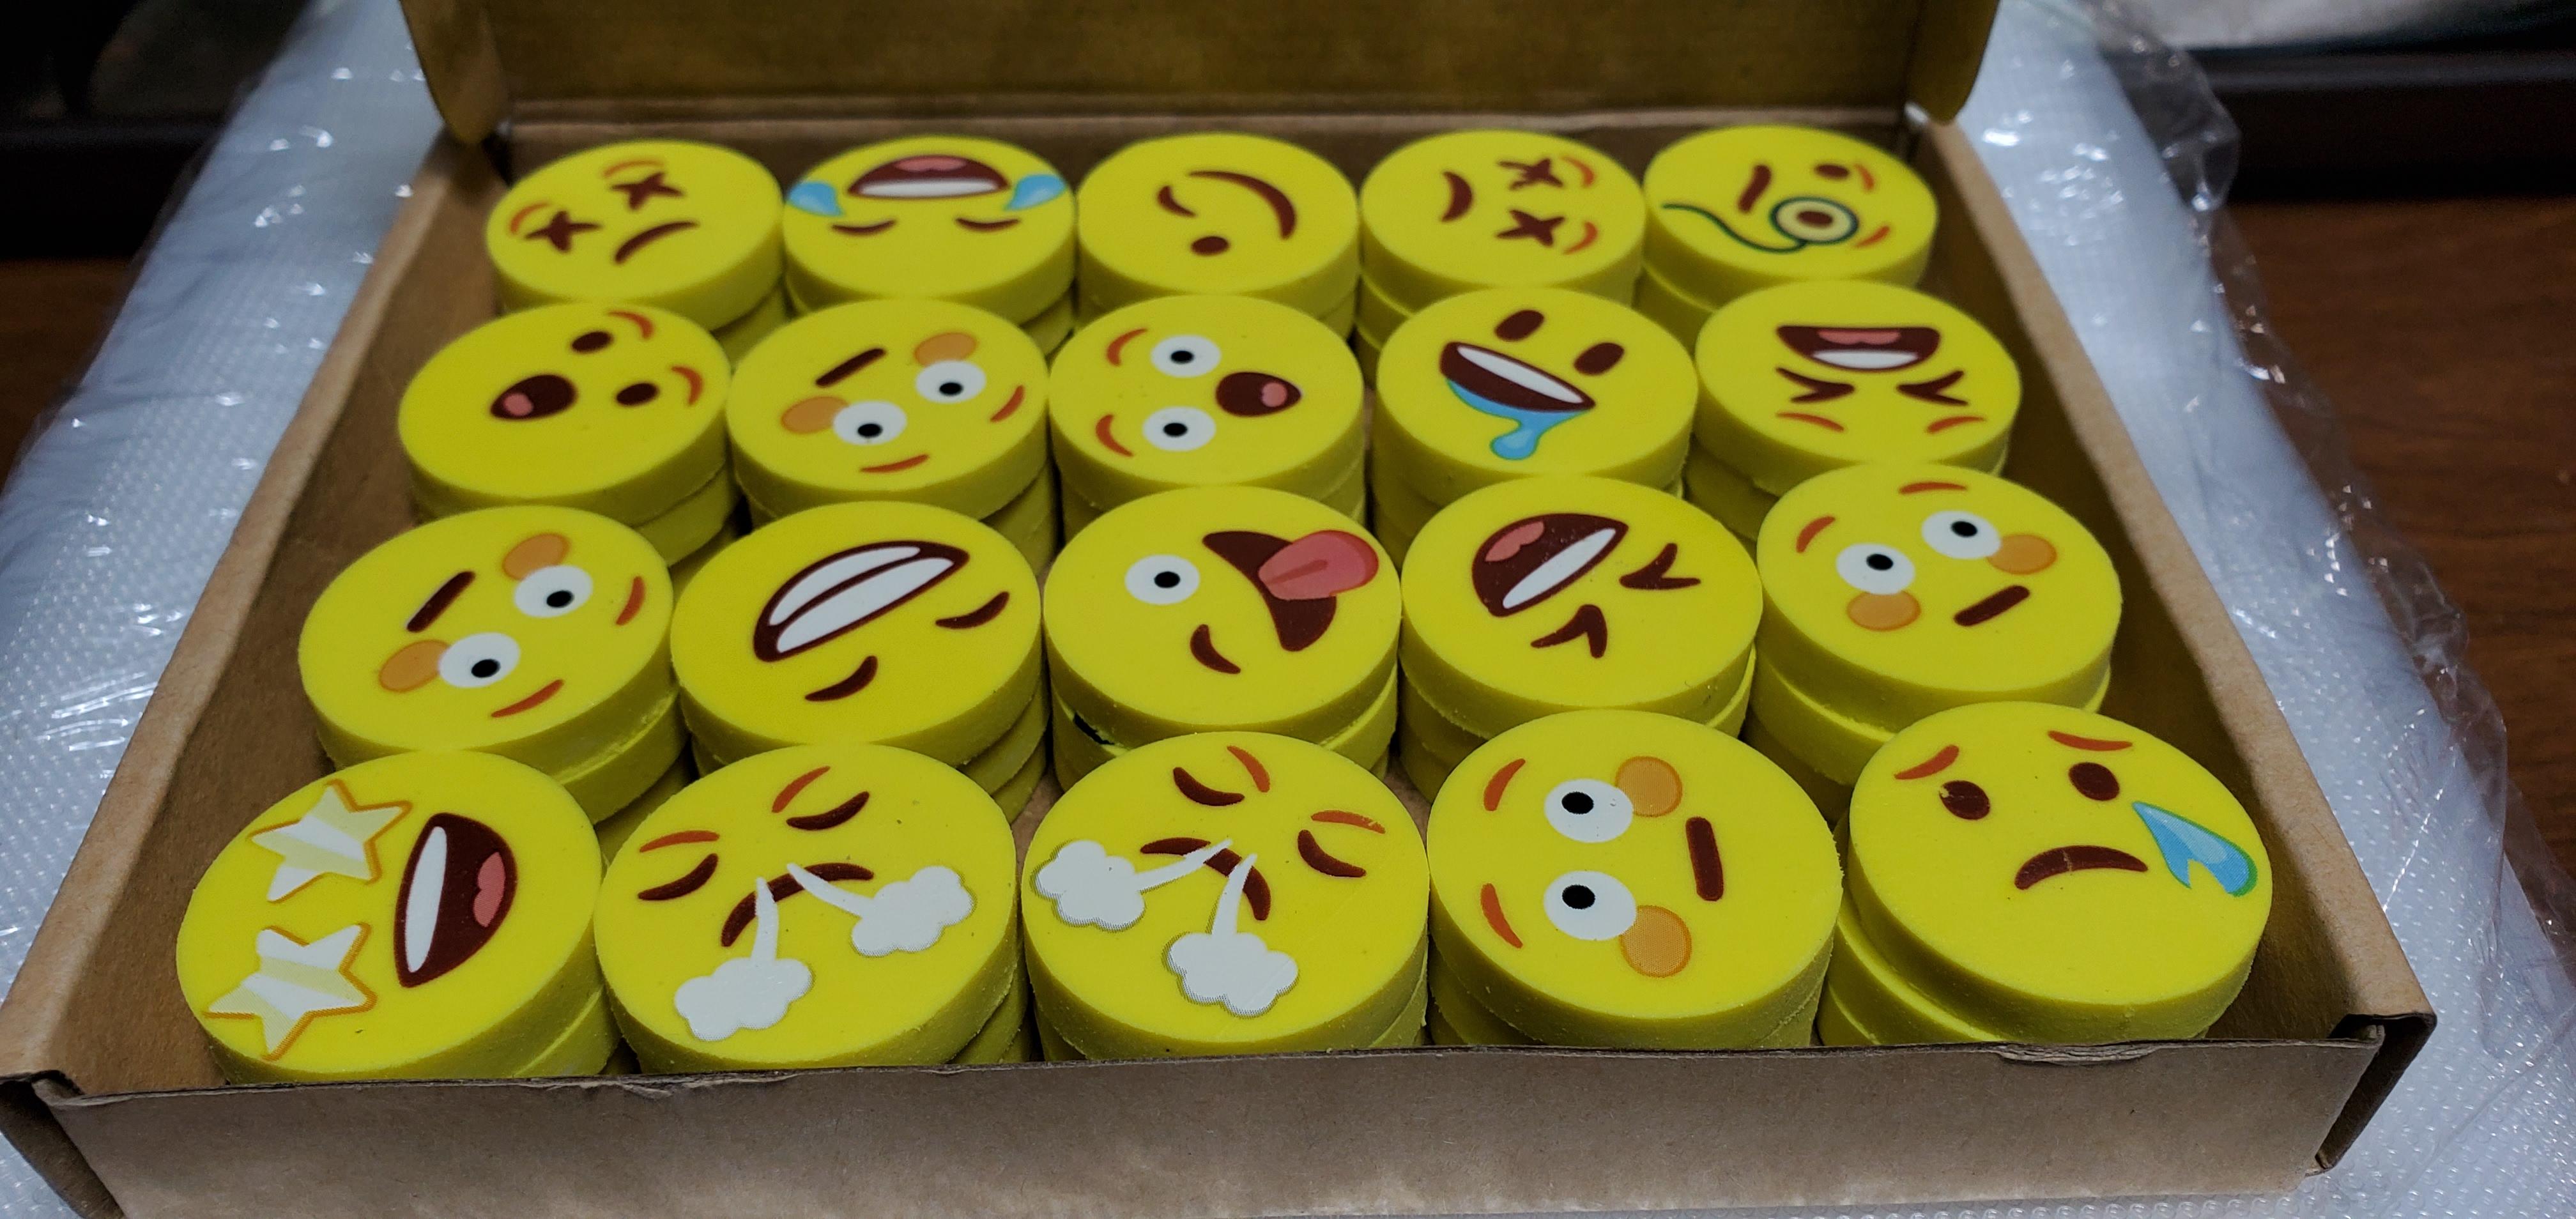 60pc emoji erasers